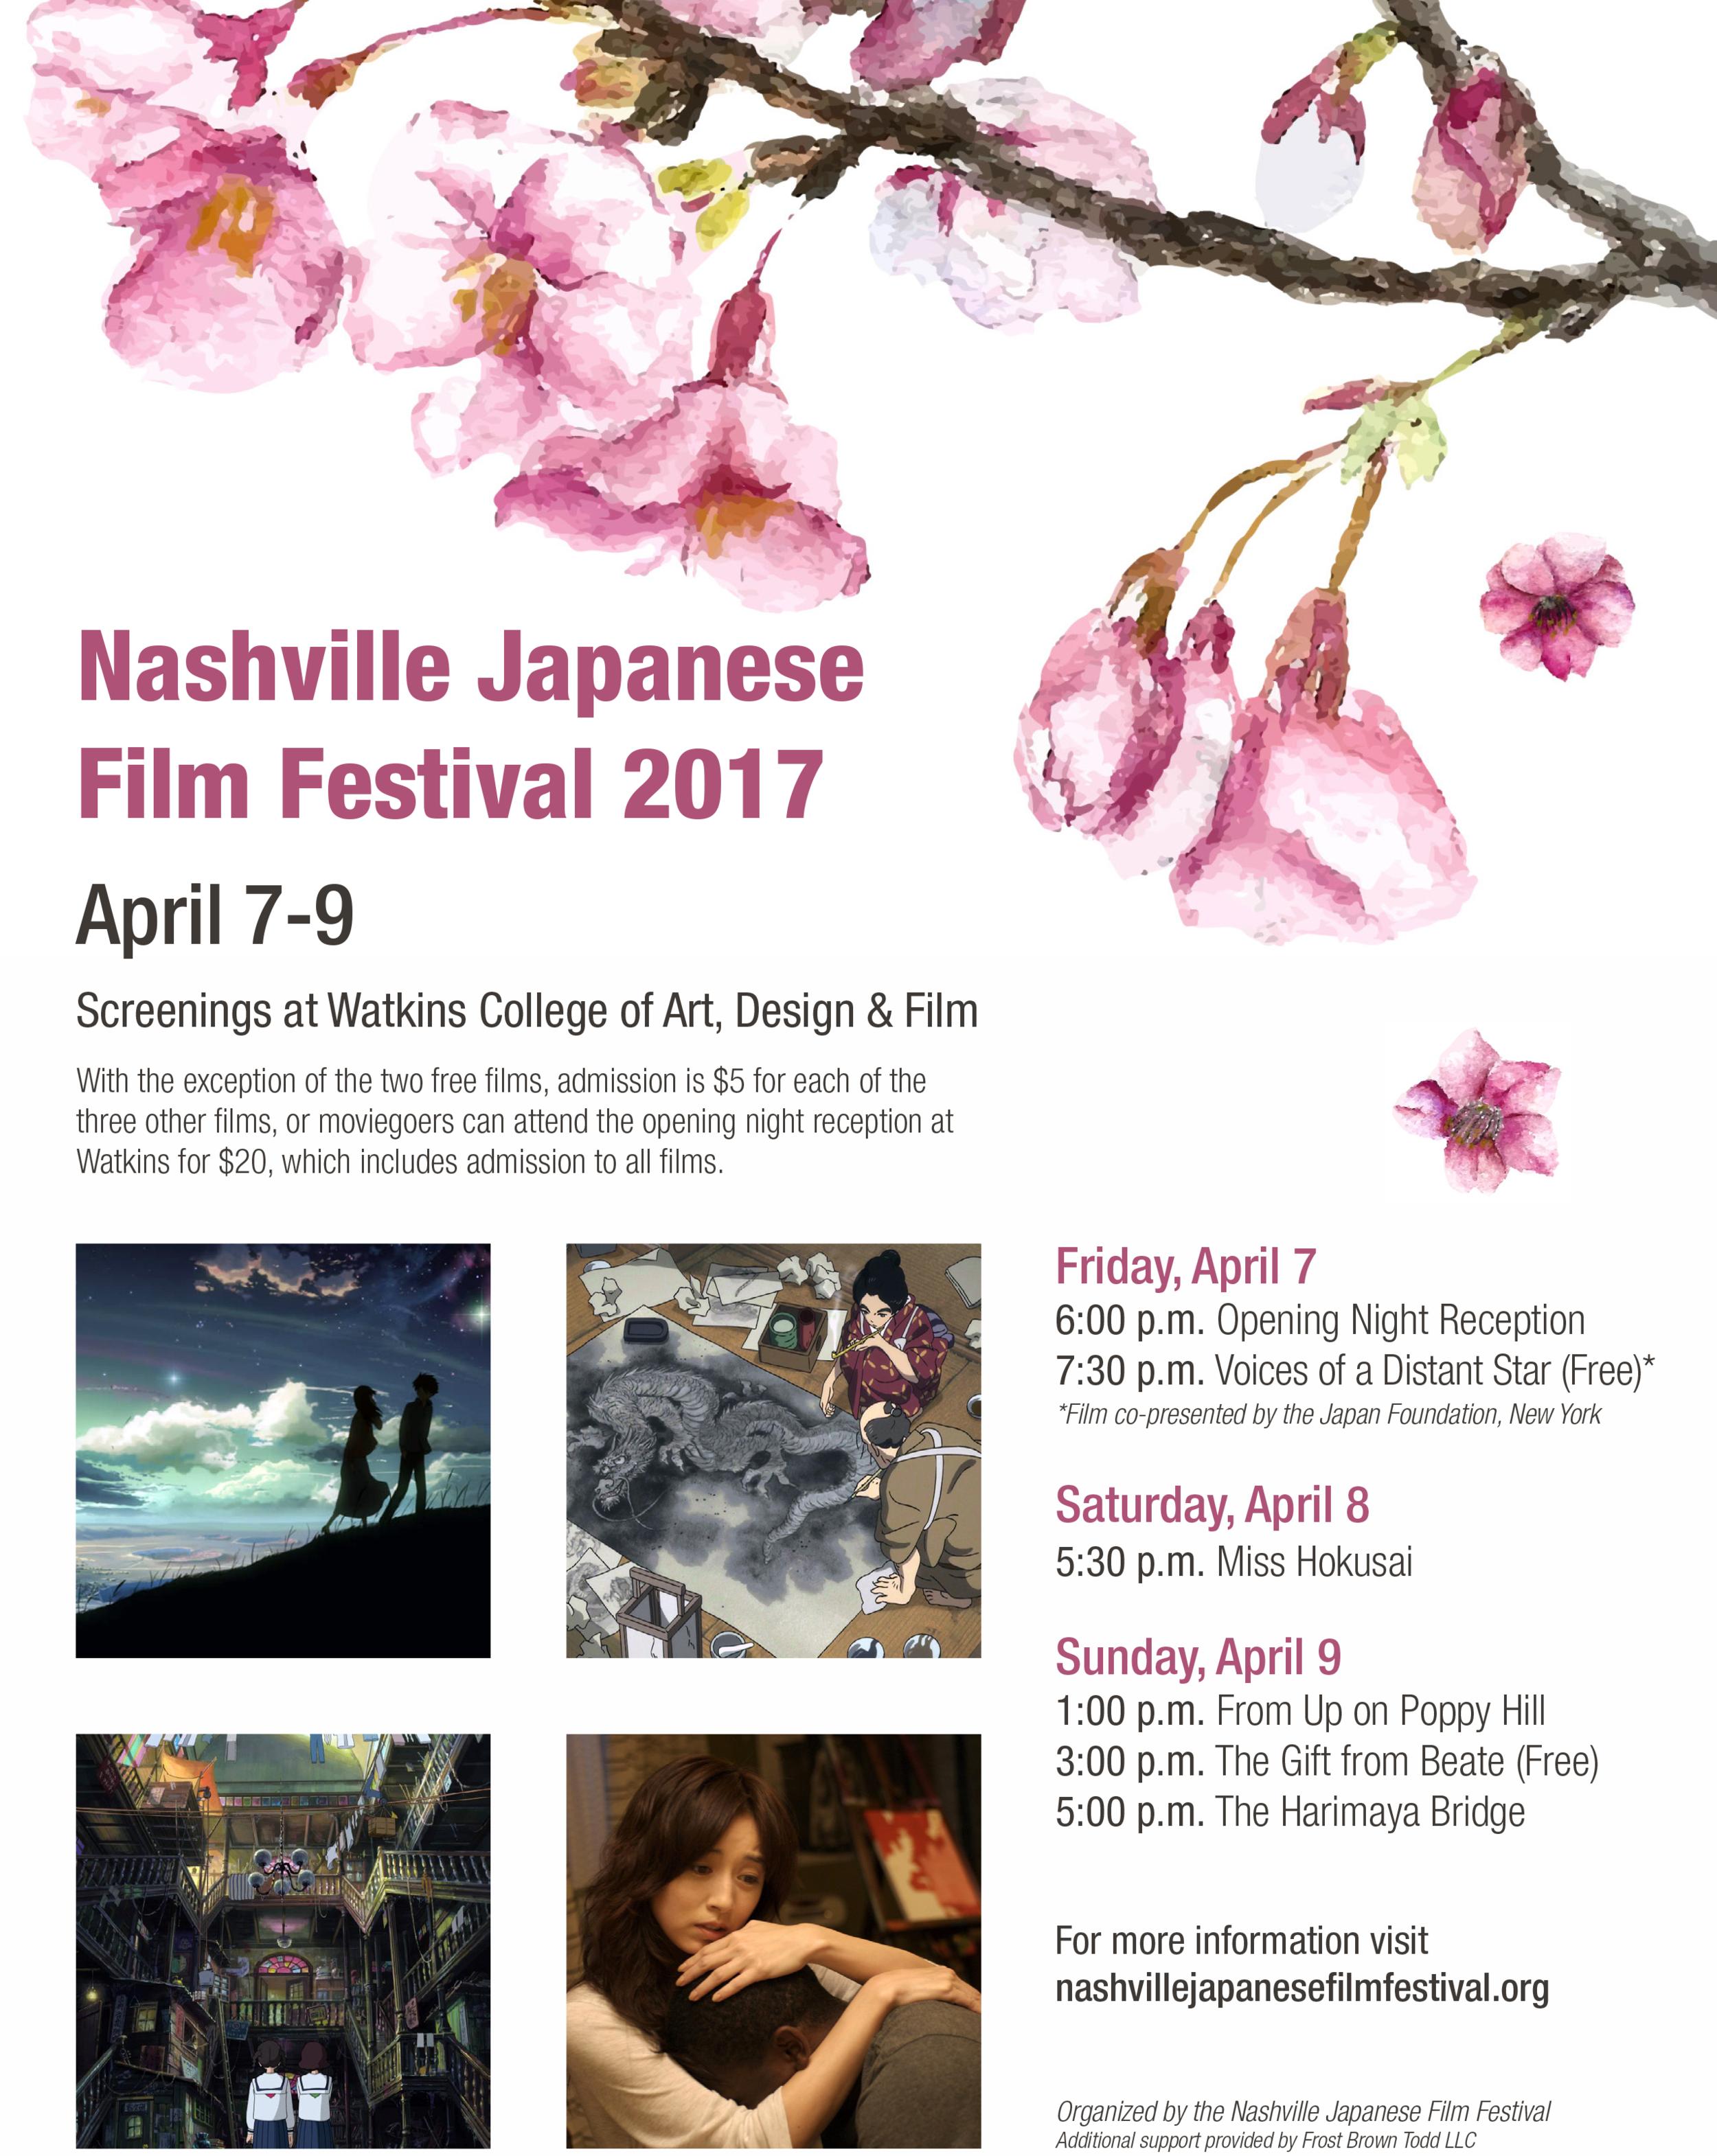 NashvilleJapaneseFilmFestival